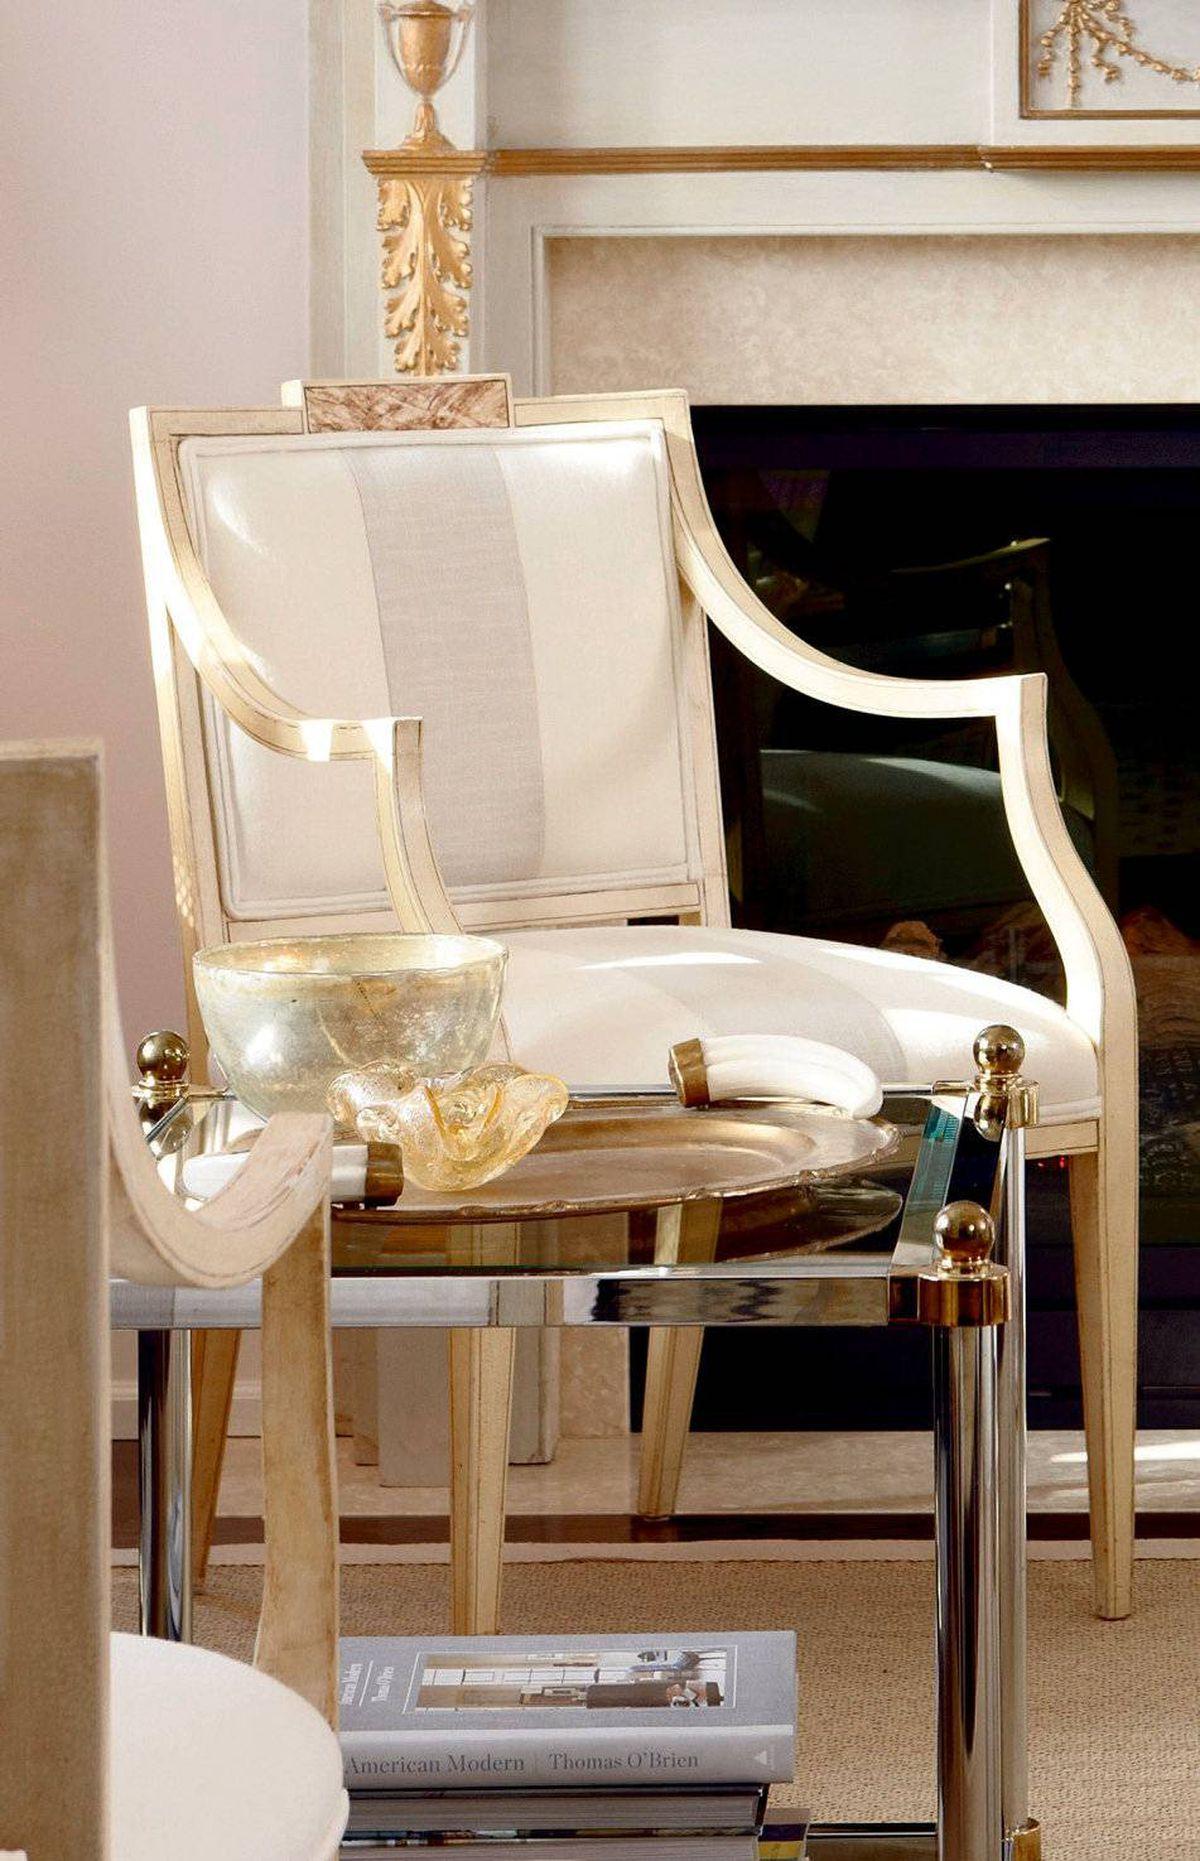 WHERE TO BUY Pair of cream painted armchairs, square wood side tables, Chair Table Lamp (www.chairtablelamp.blogspot.com). Fabrics, Designer Fabrics (www.designerfabrics.ca).